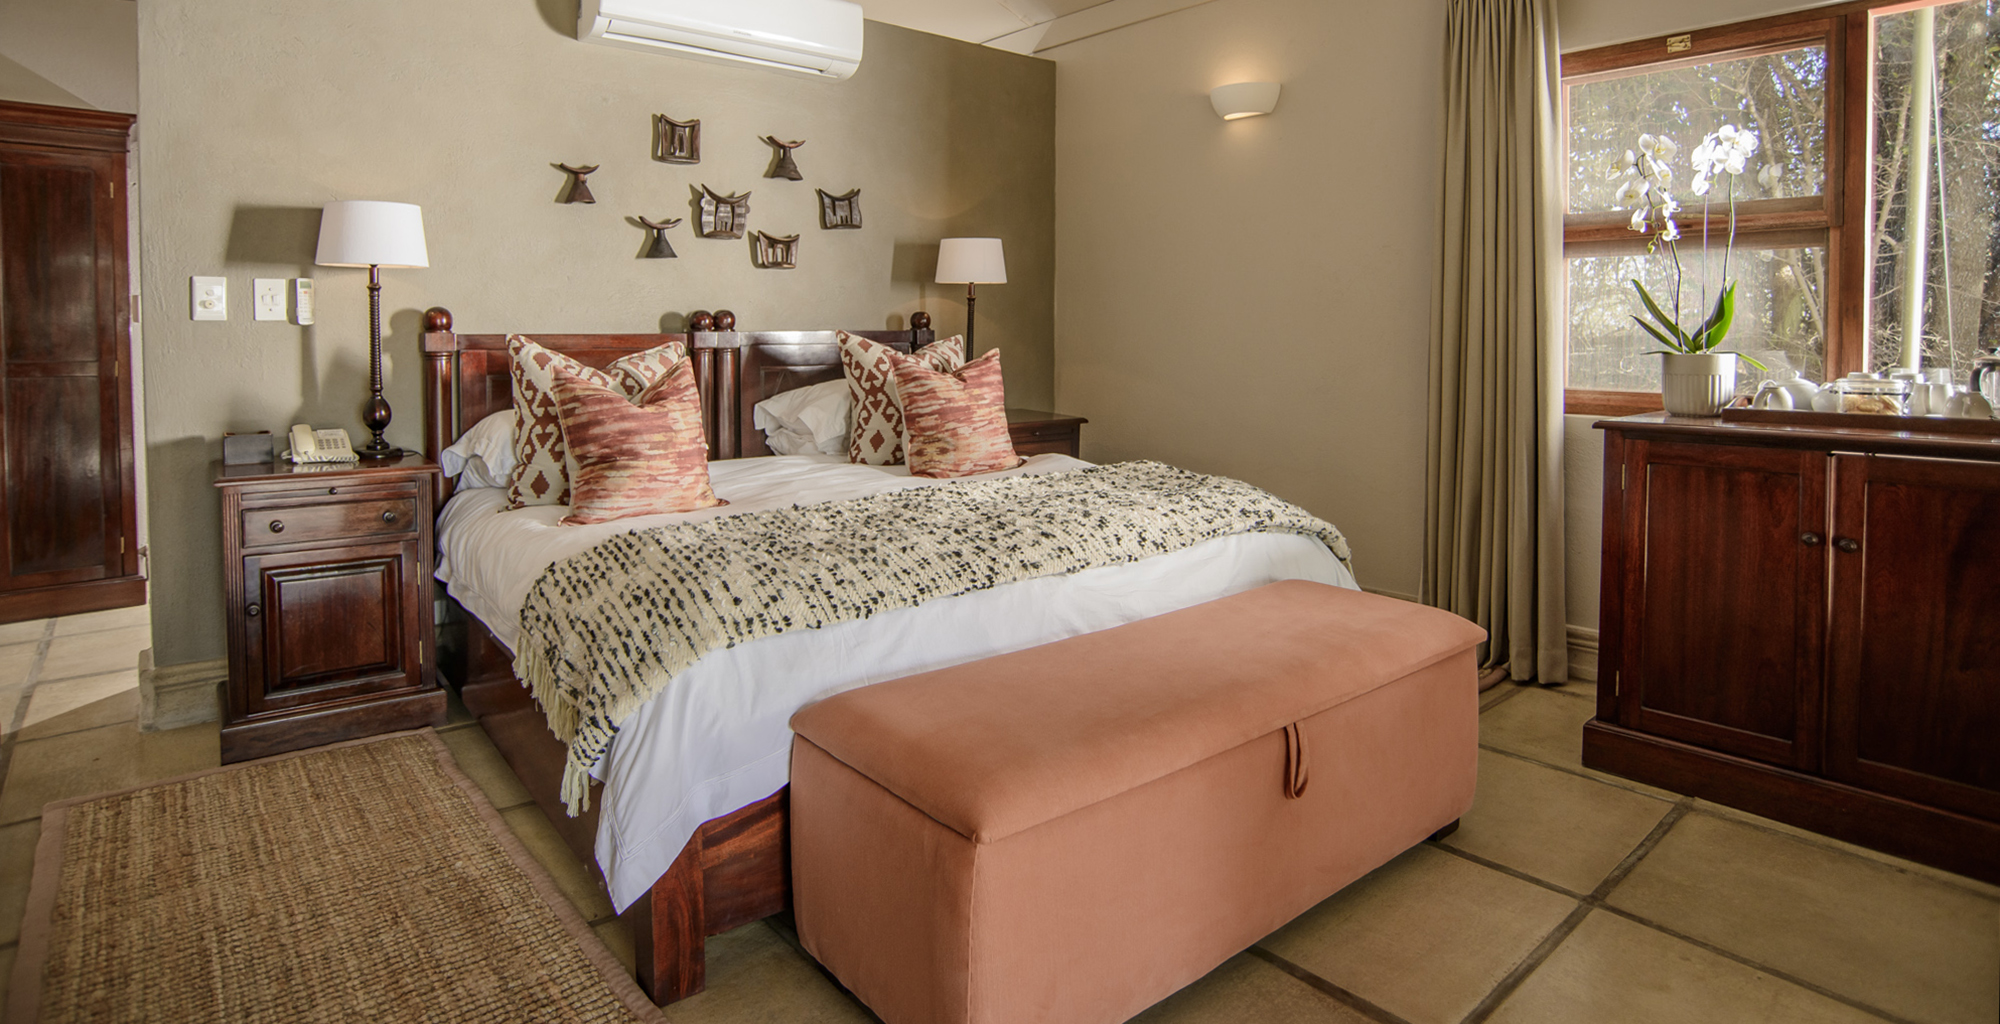 South-Africa-Savanna-Private-Bedroom-Interior